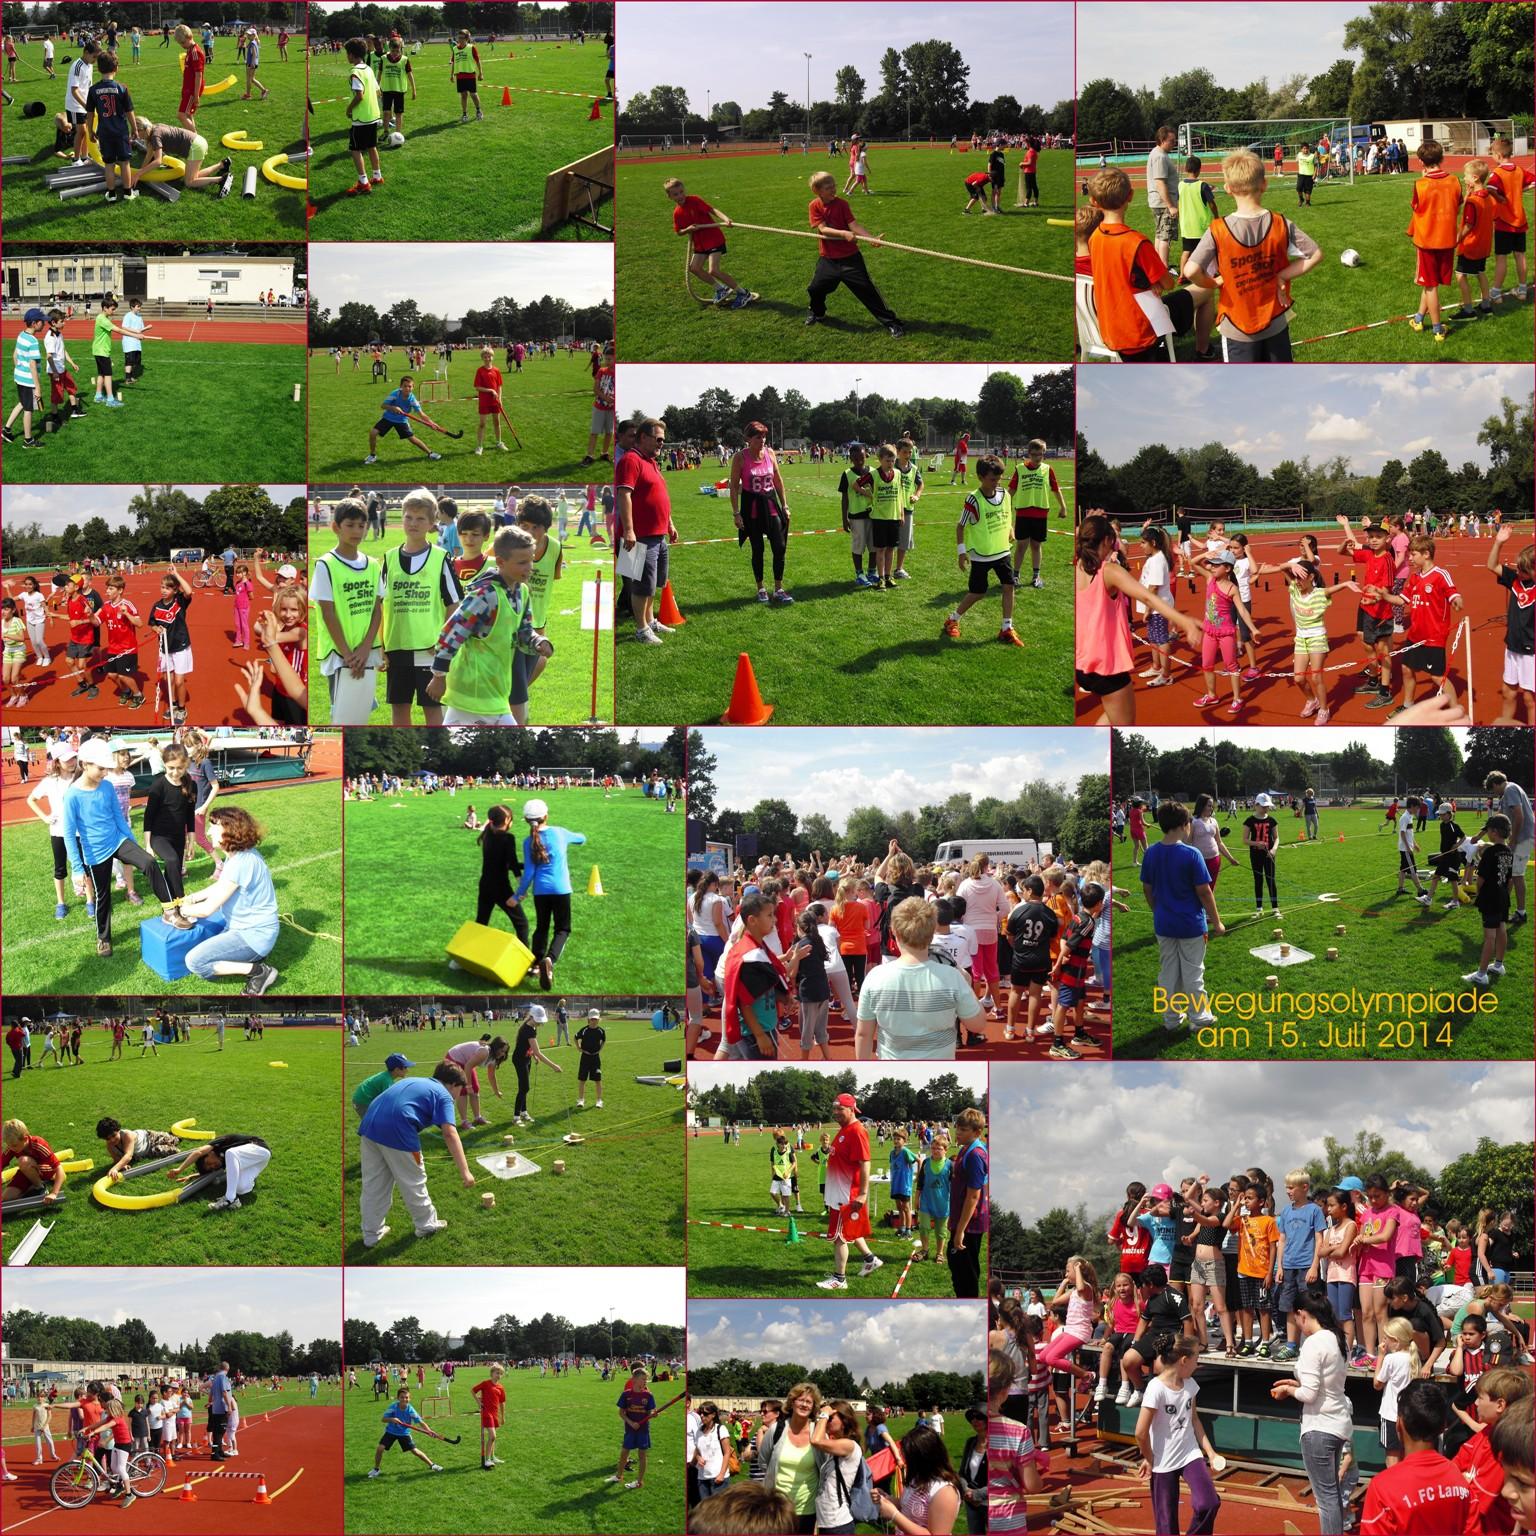 2014-07-15_Bewegungsolympiade_Teil2_kl.jpg